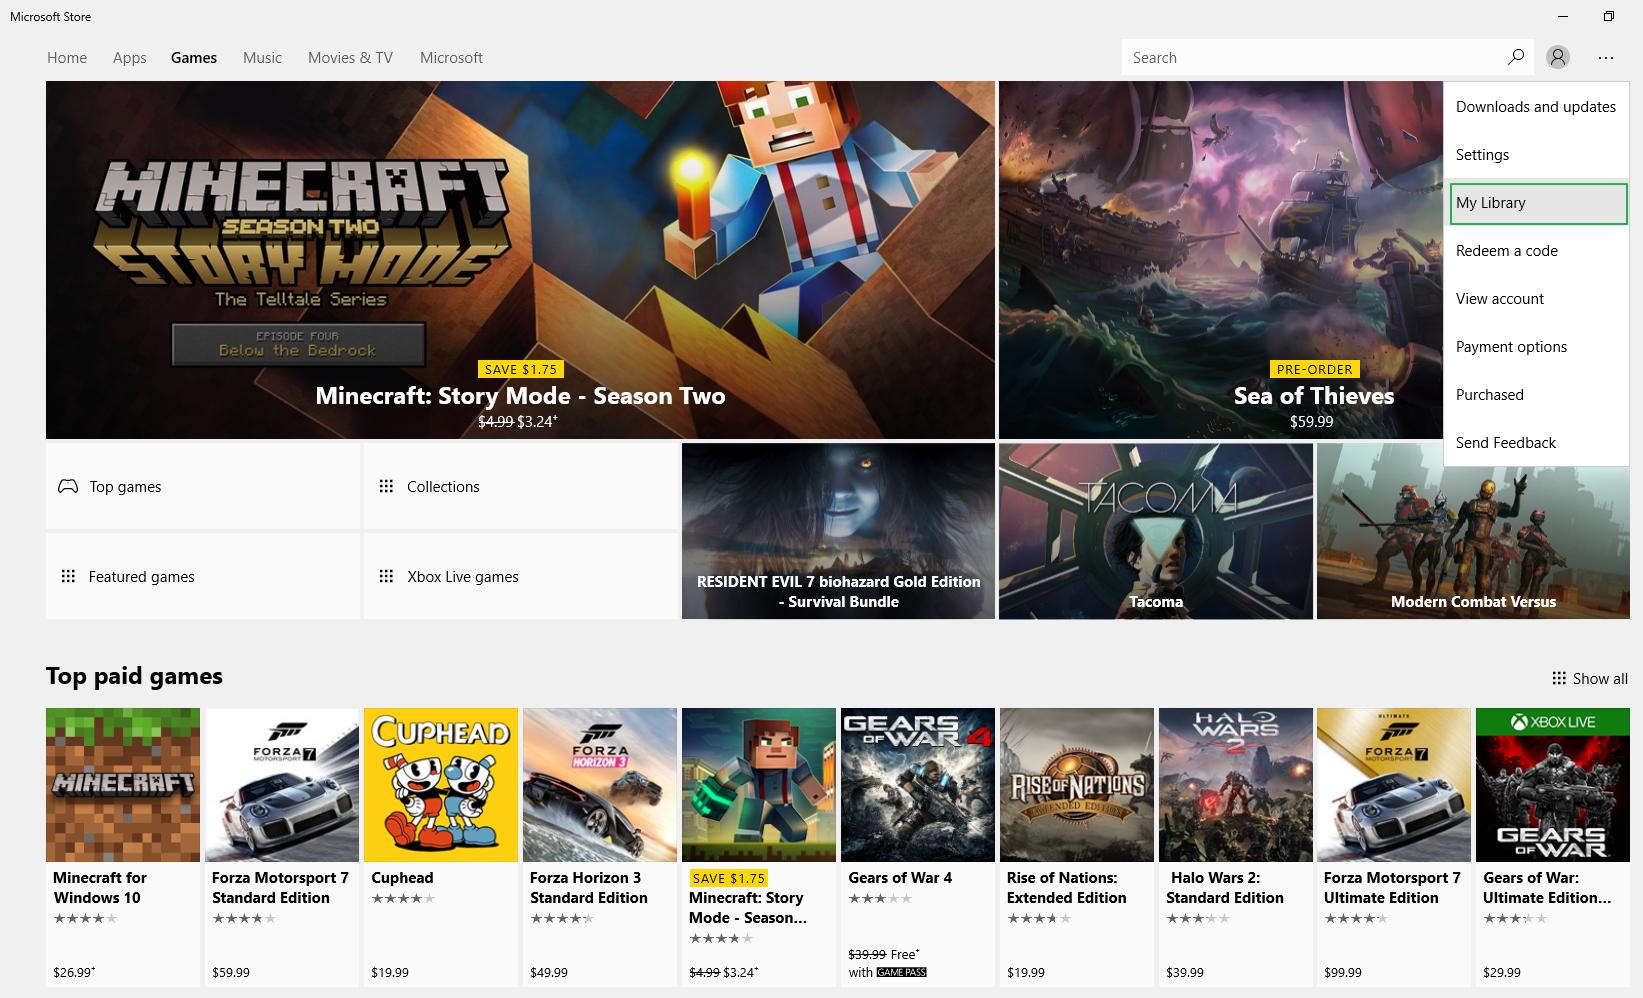 Microsoft Store Games tab